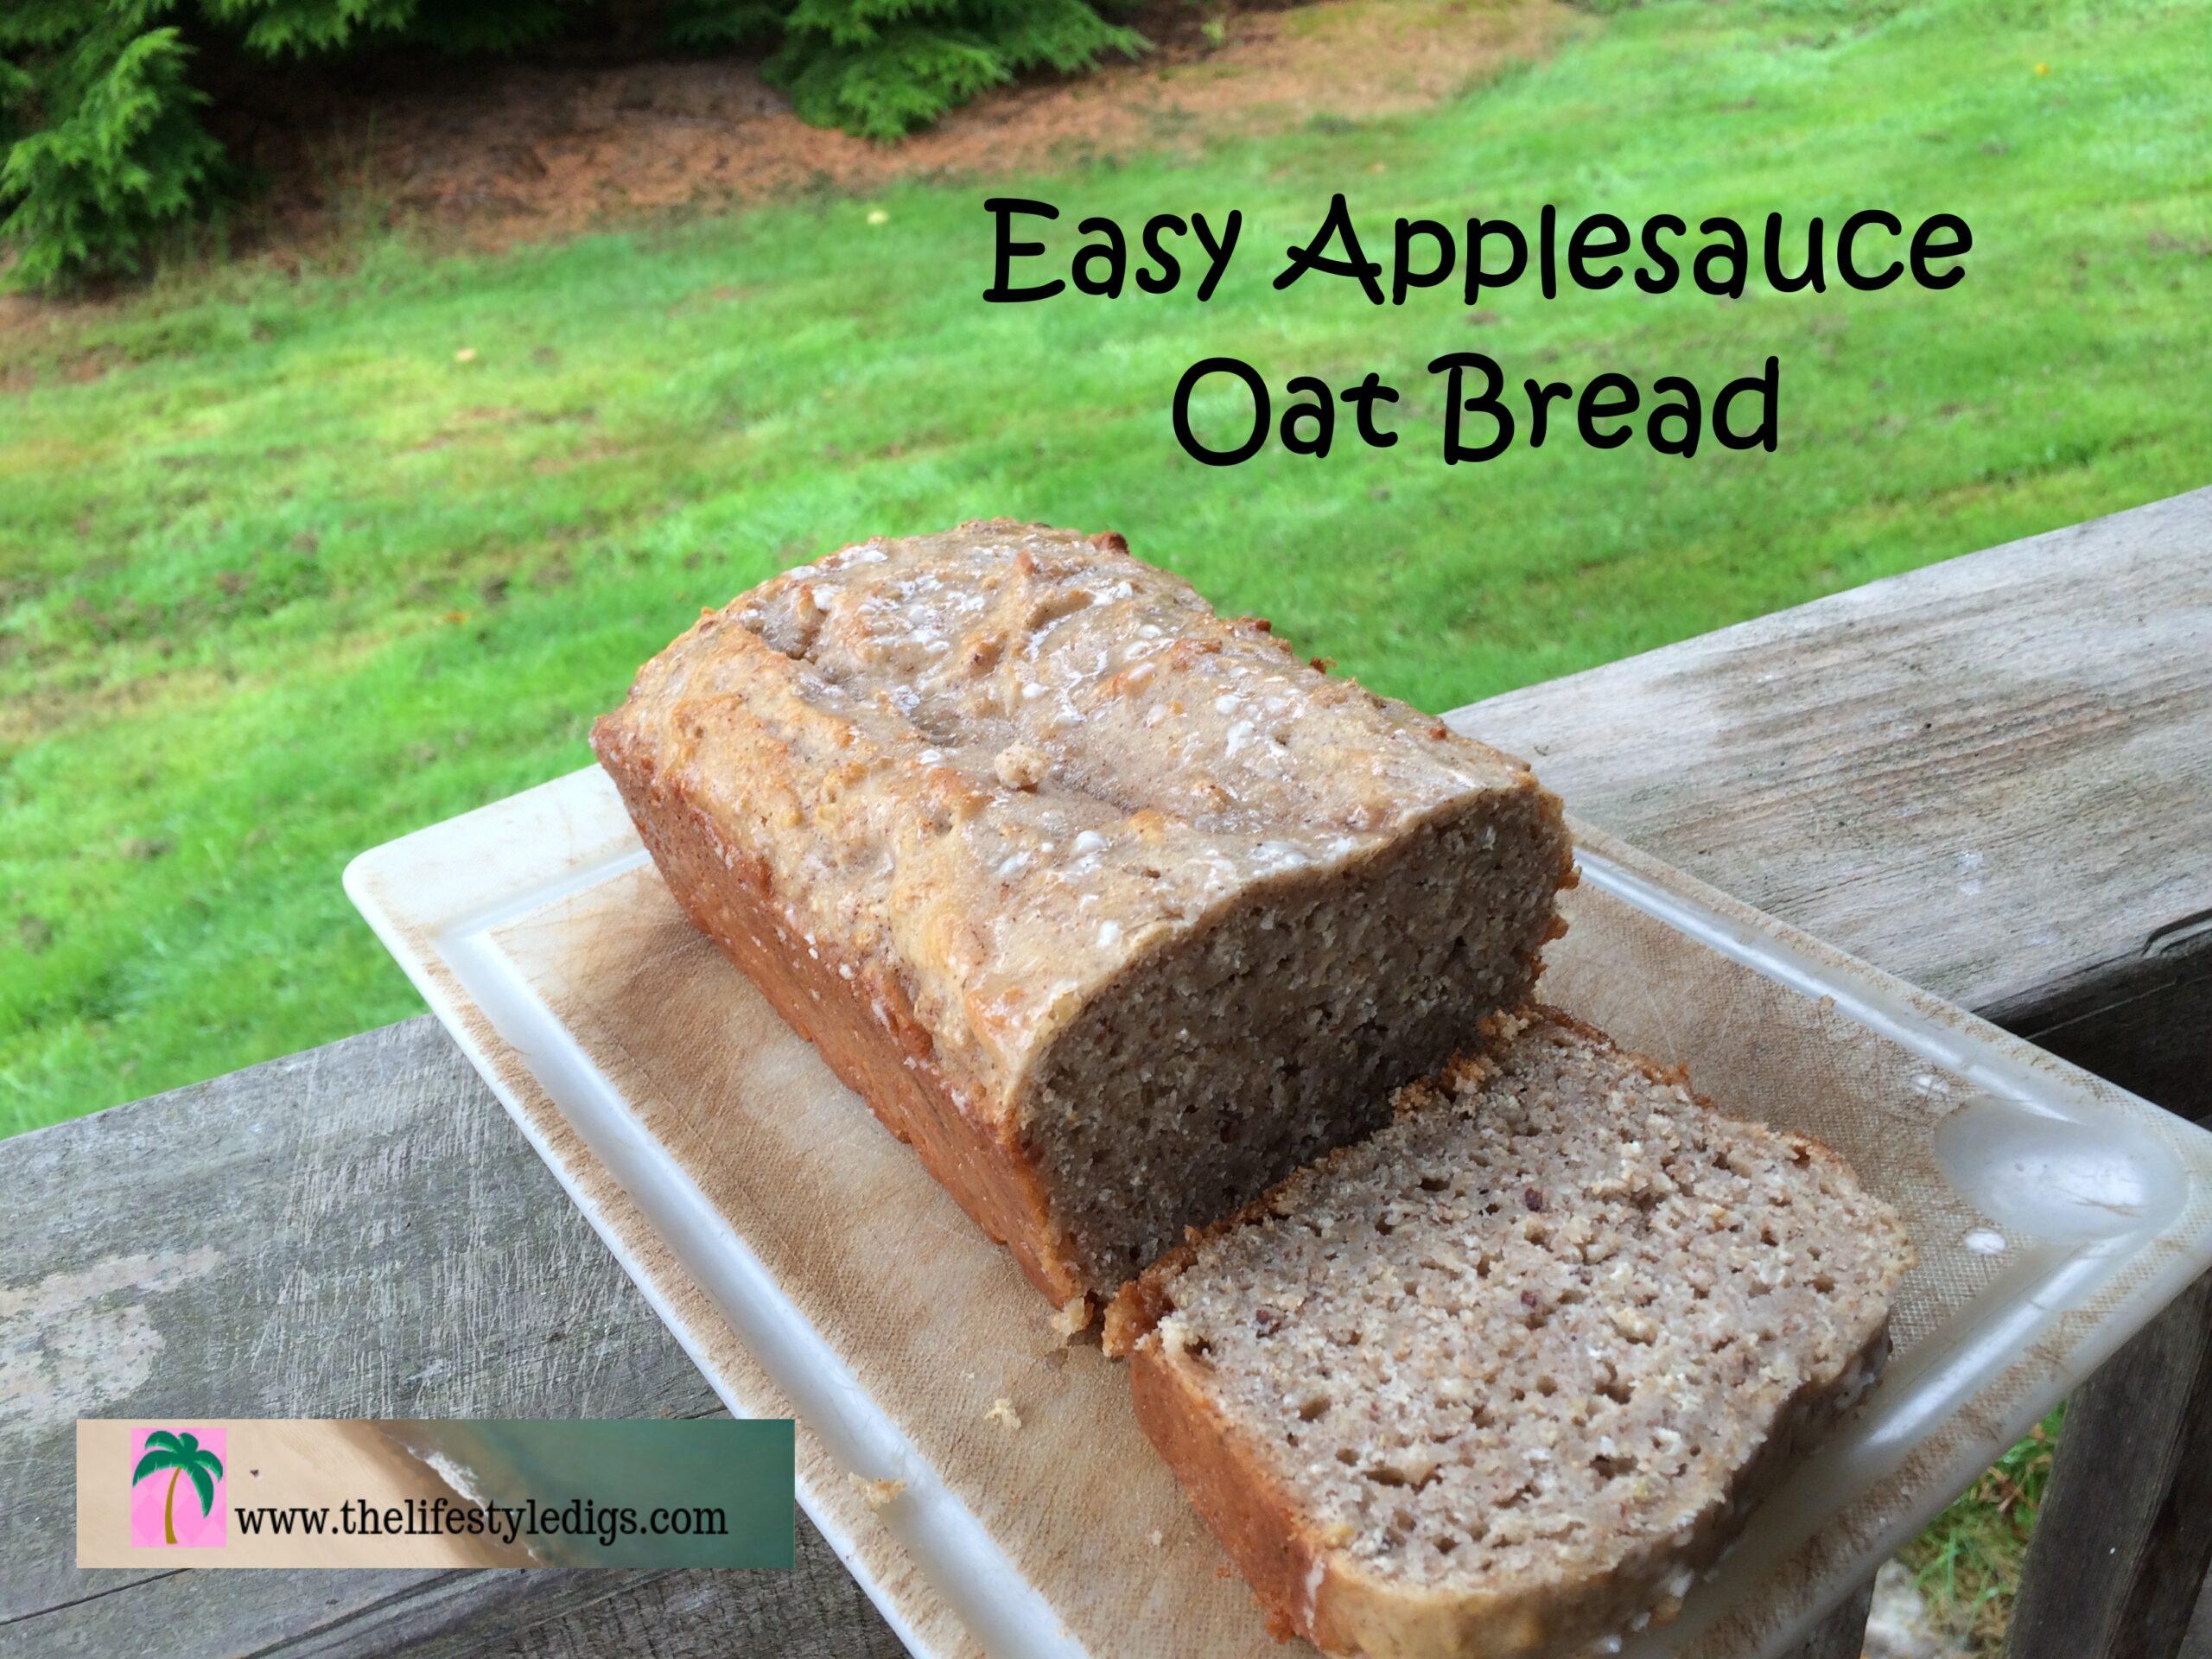 Easy Applesauce Oat Bread